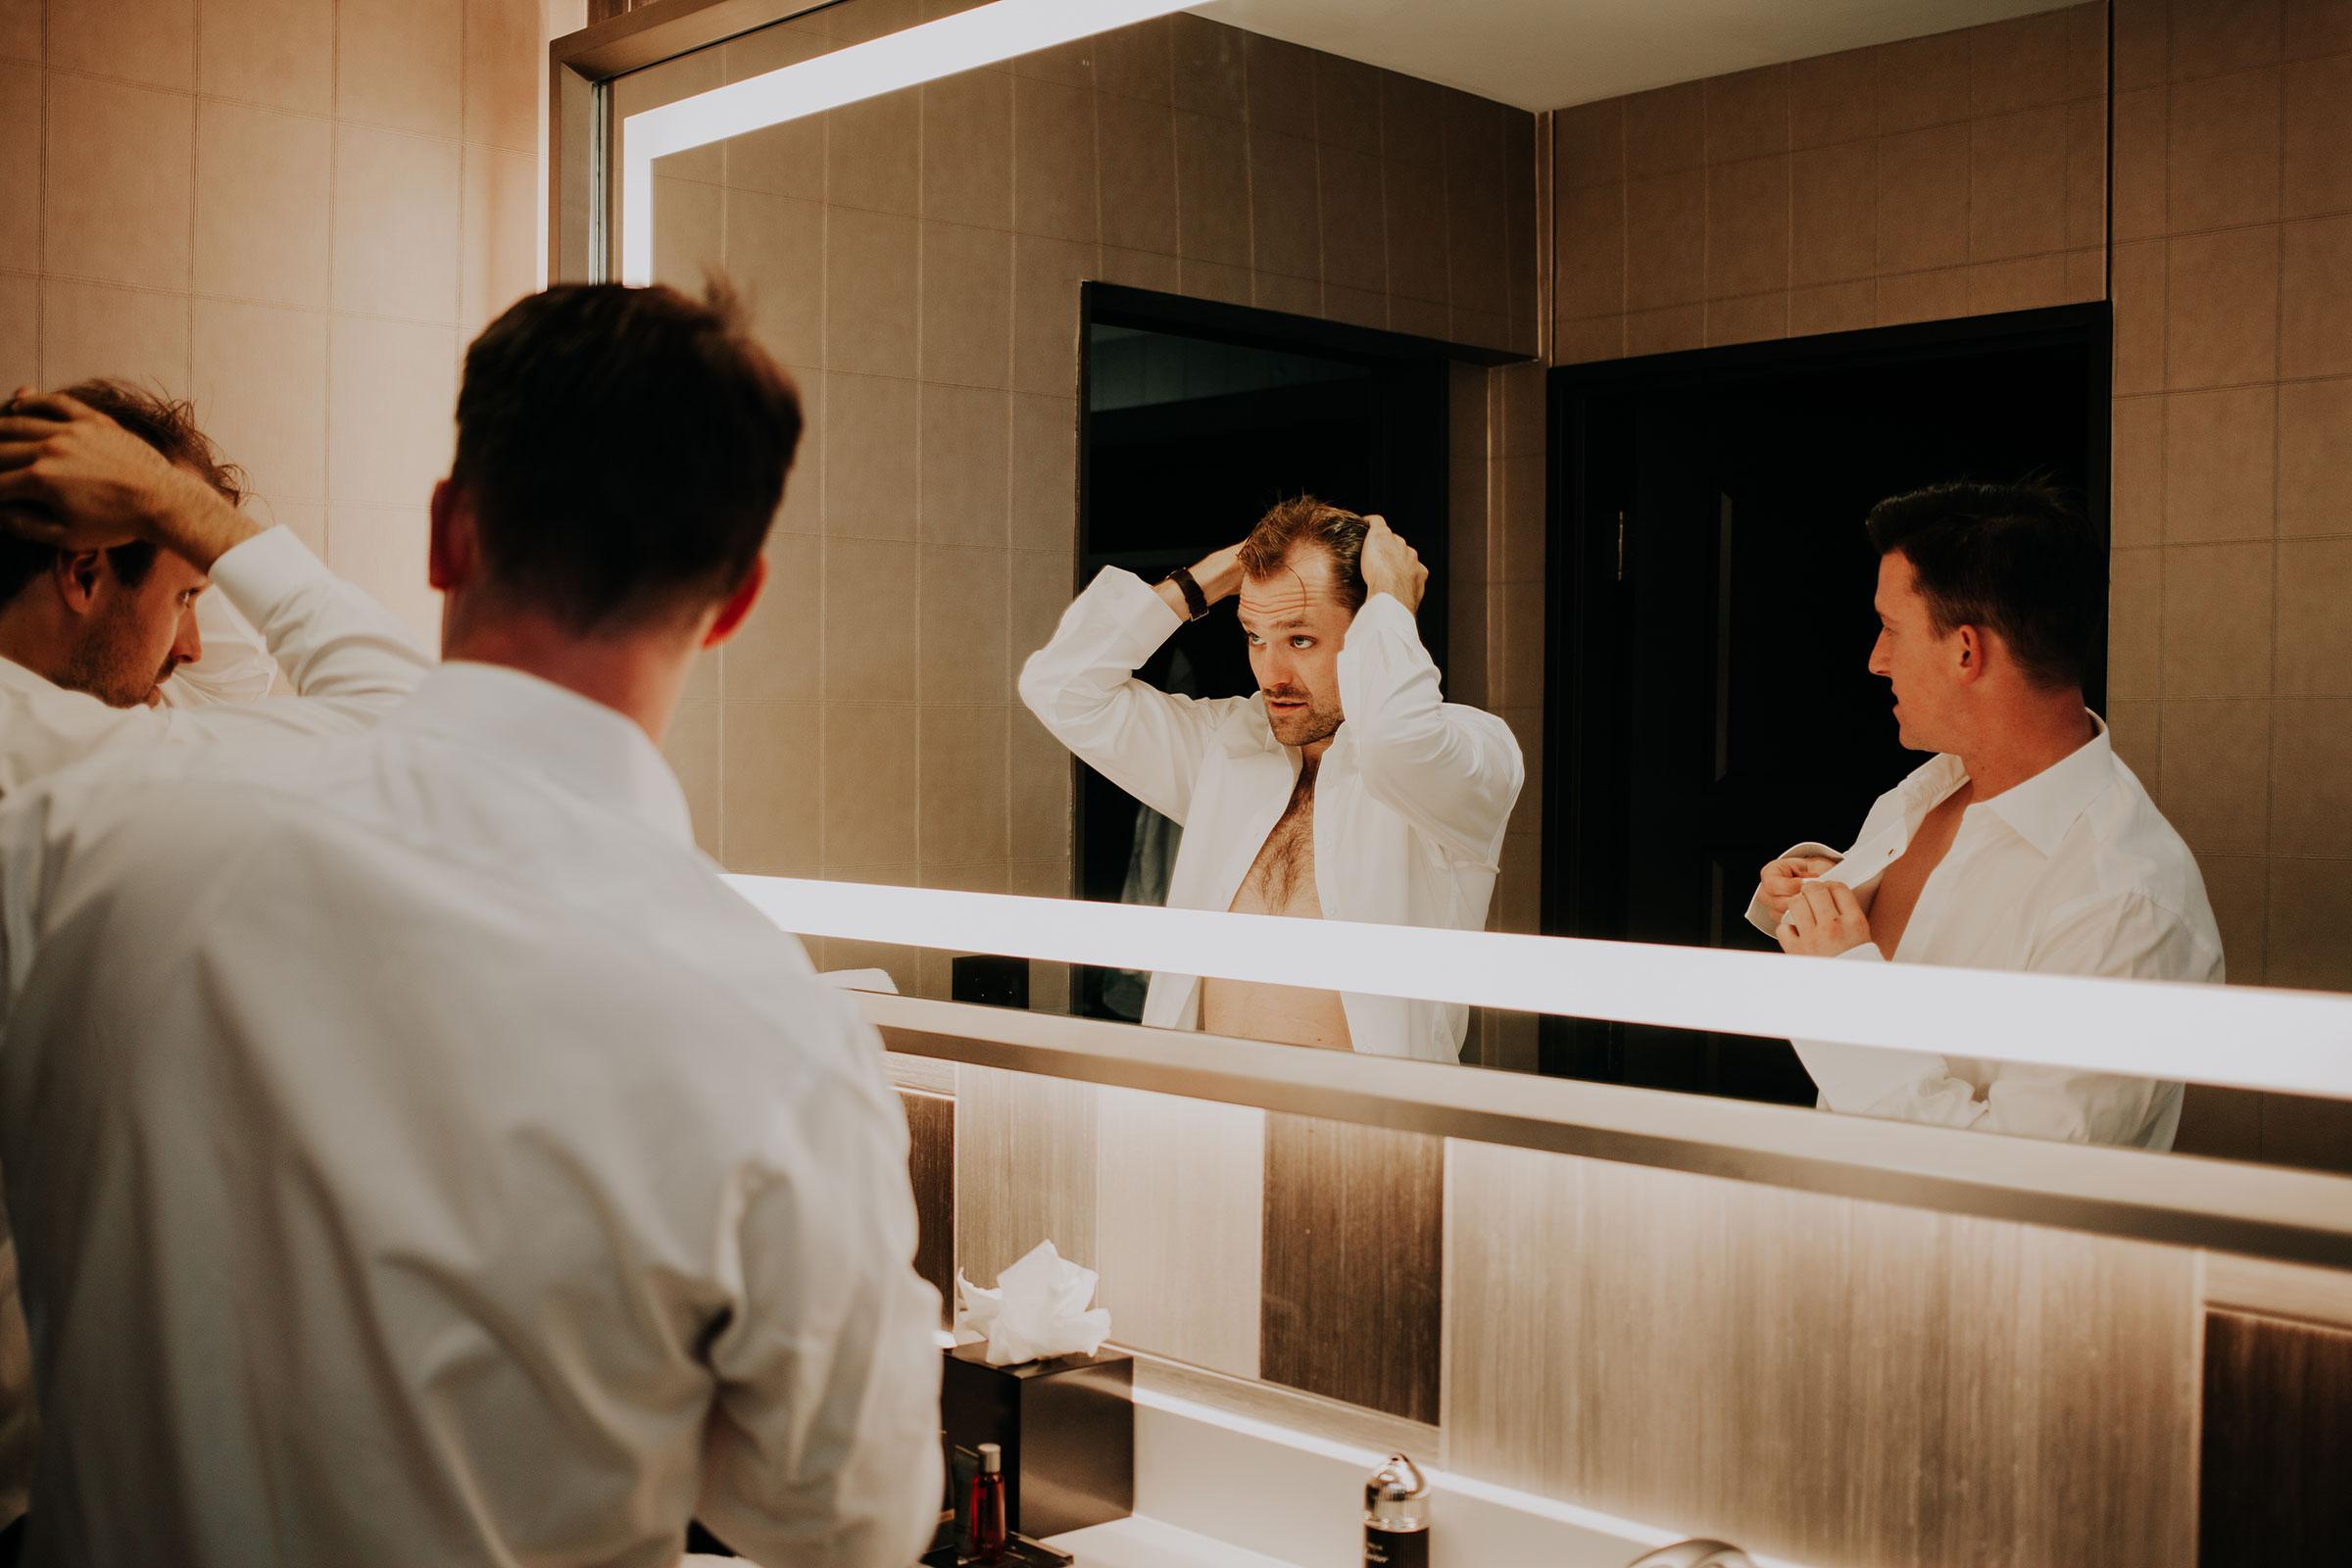 groom-and-groomsmen-getting-ready-in-mirror-hilton-omaha-nebraska-raelyn-ramey-photography.jpg